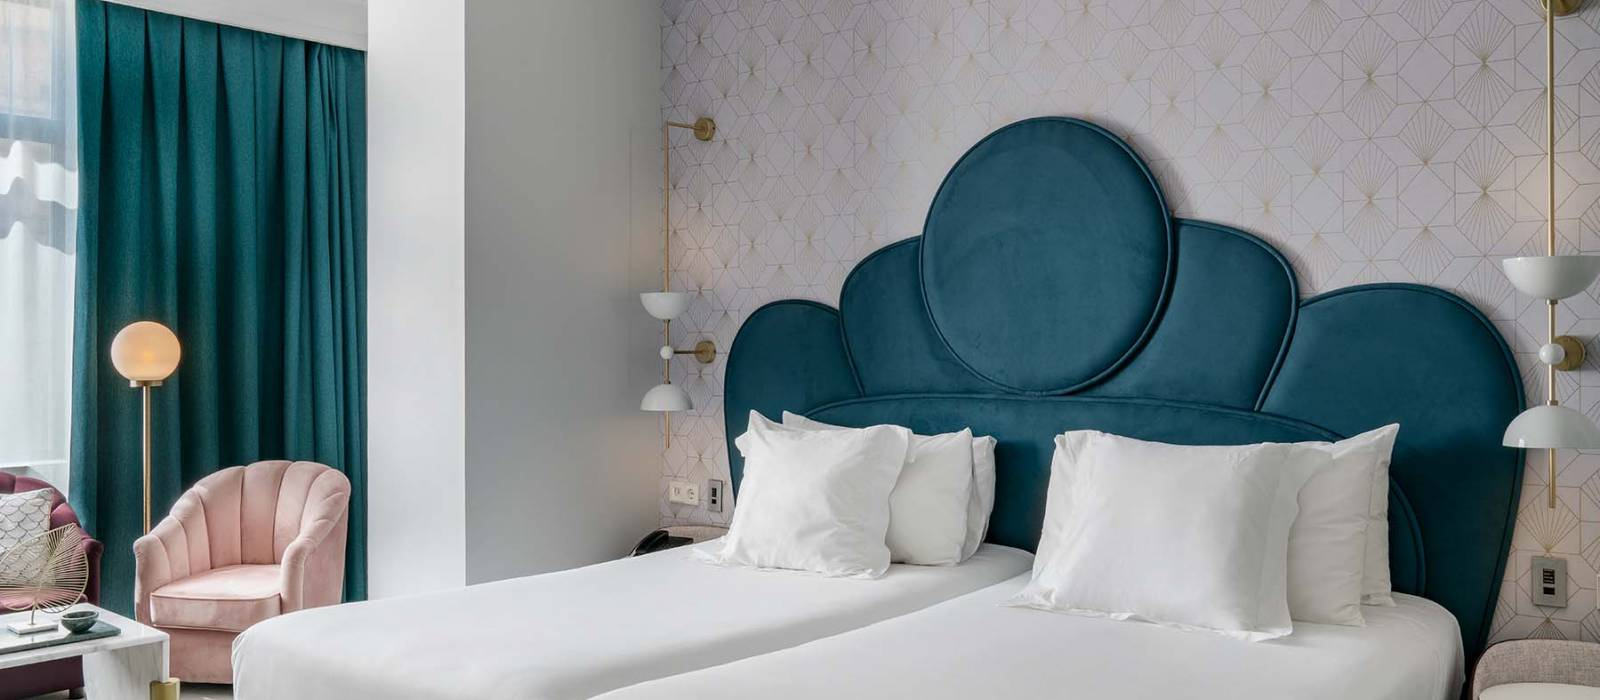 Chambres Capitol Hôtel Madrid - Vincci Hoteles - Chambre Premium